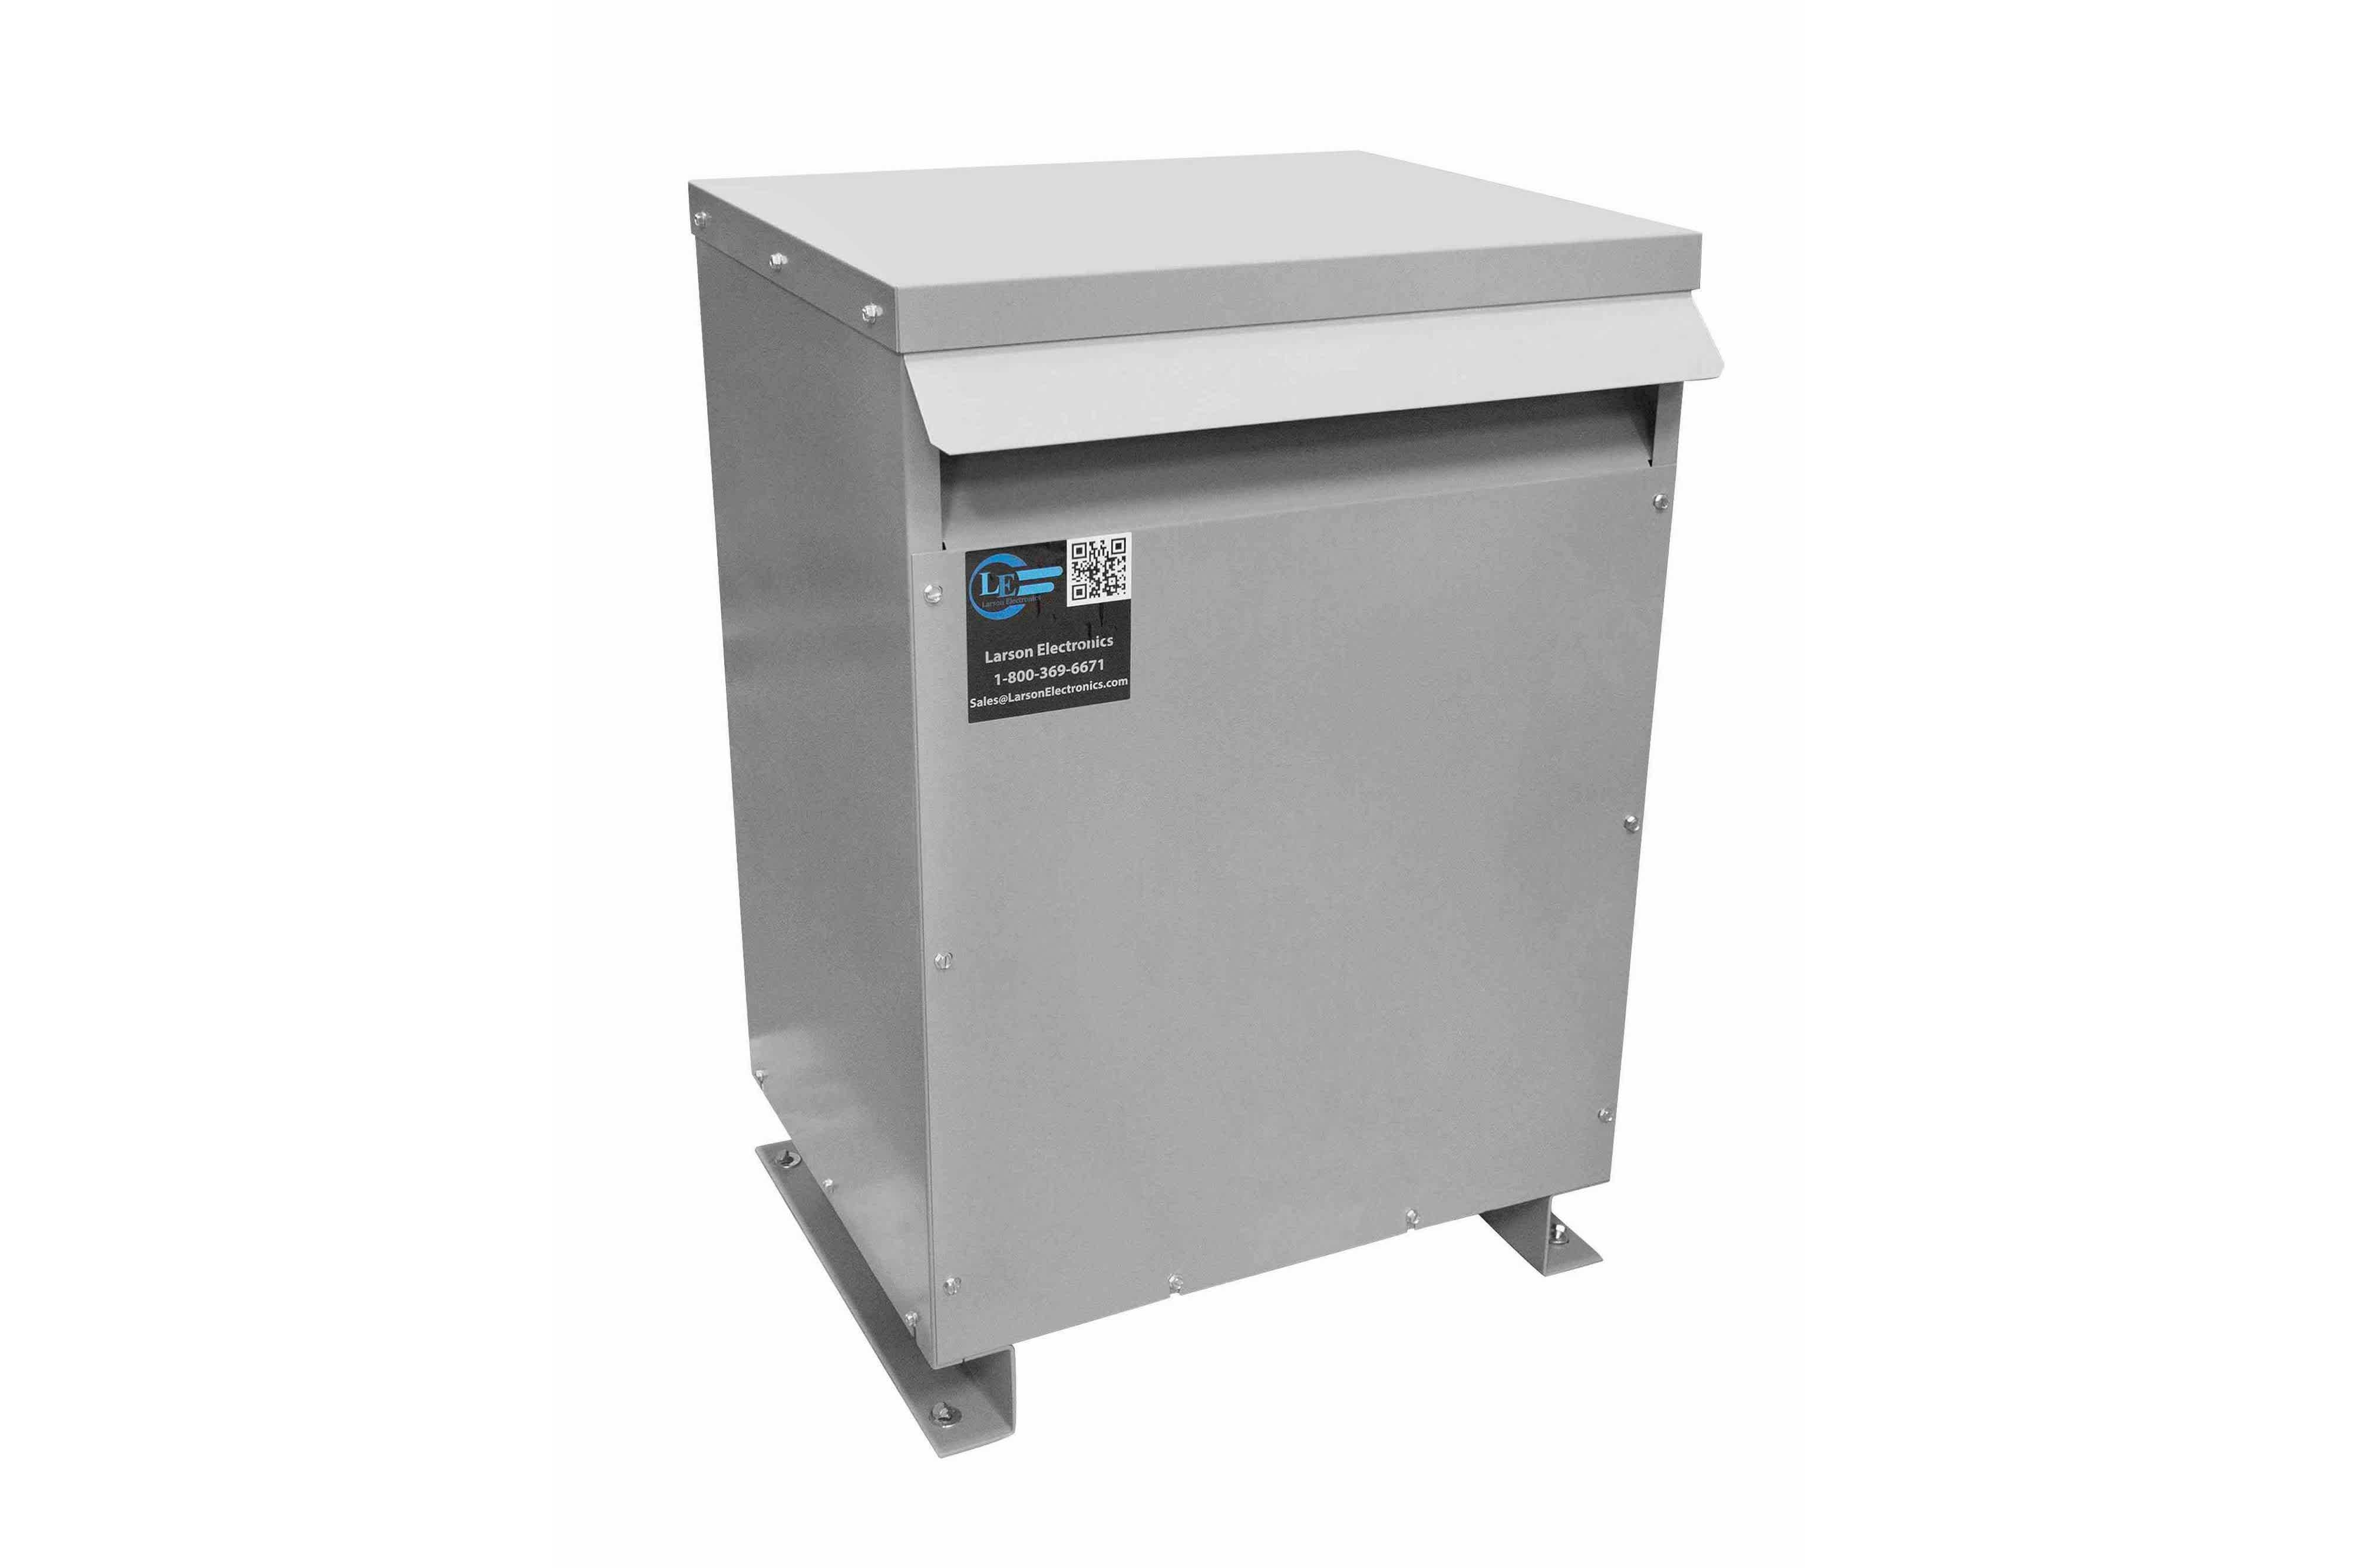 167 kVA 3PH Isolation Transformer, 415V Wye Primary, 480V Delta Secondary, N3R, Ventilated, 60 Hz